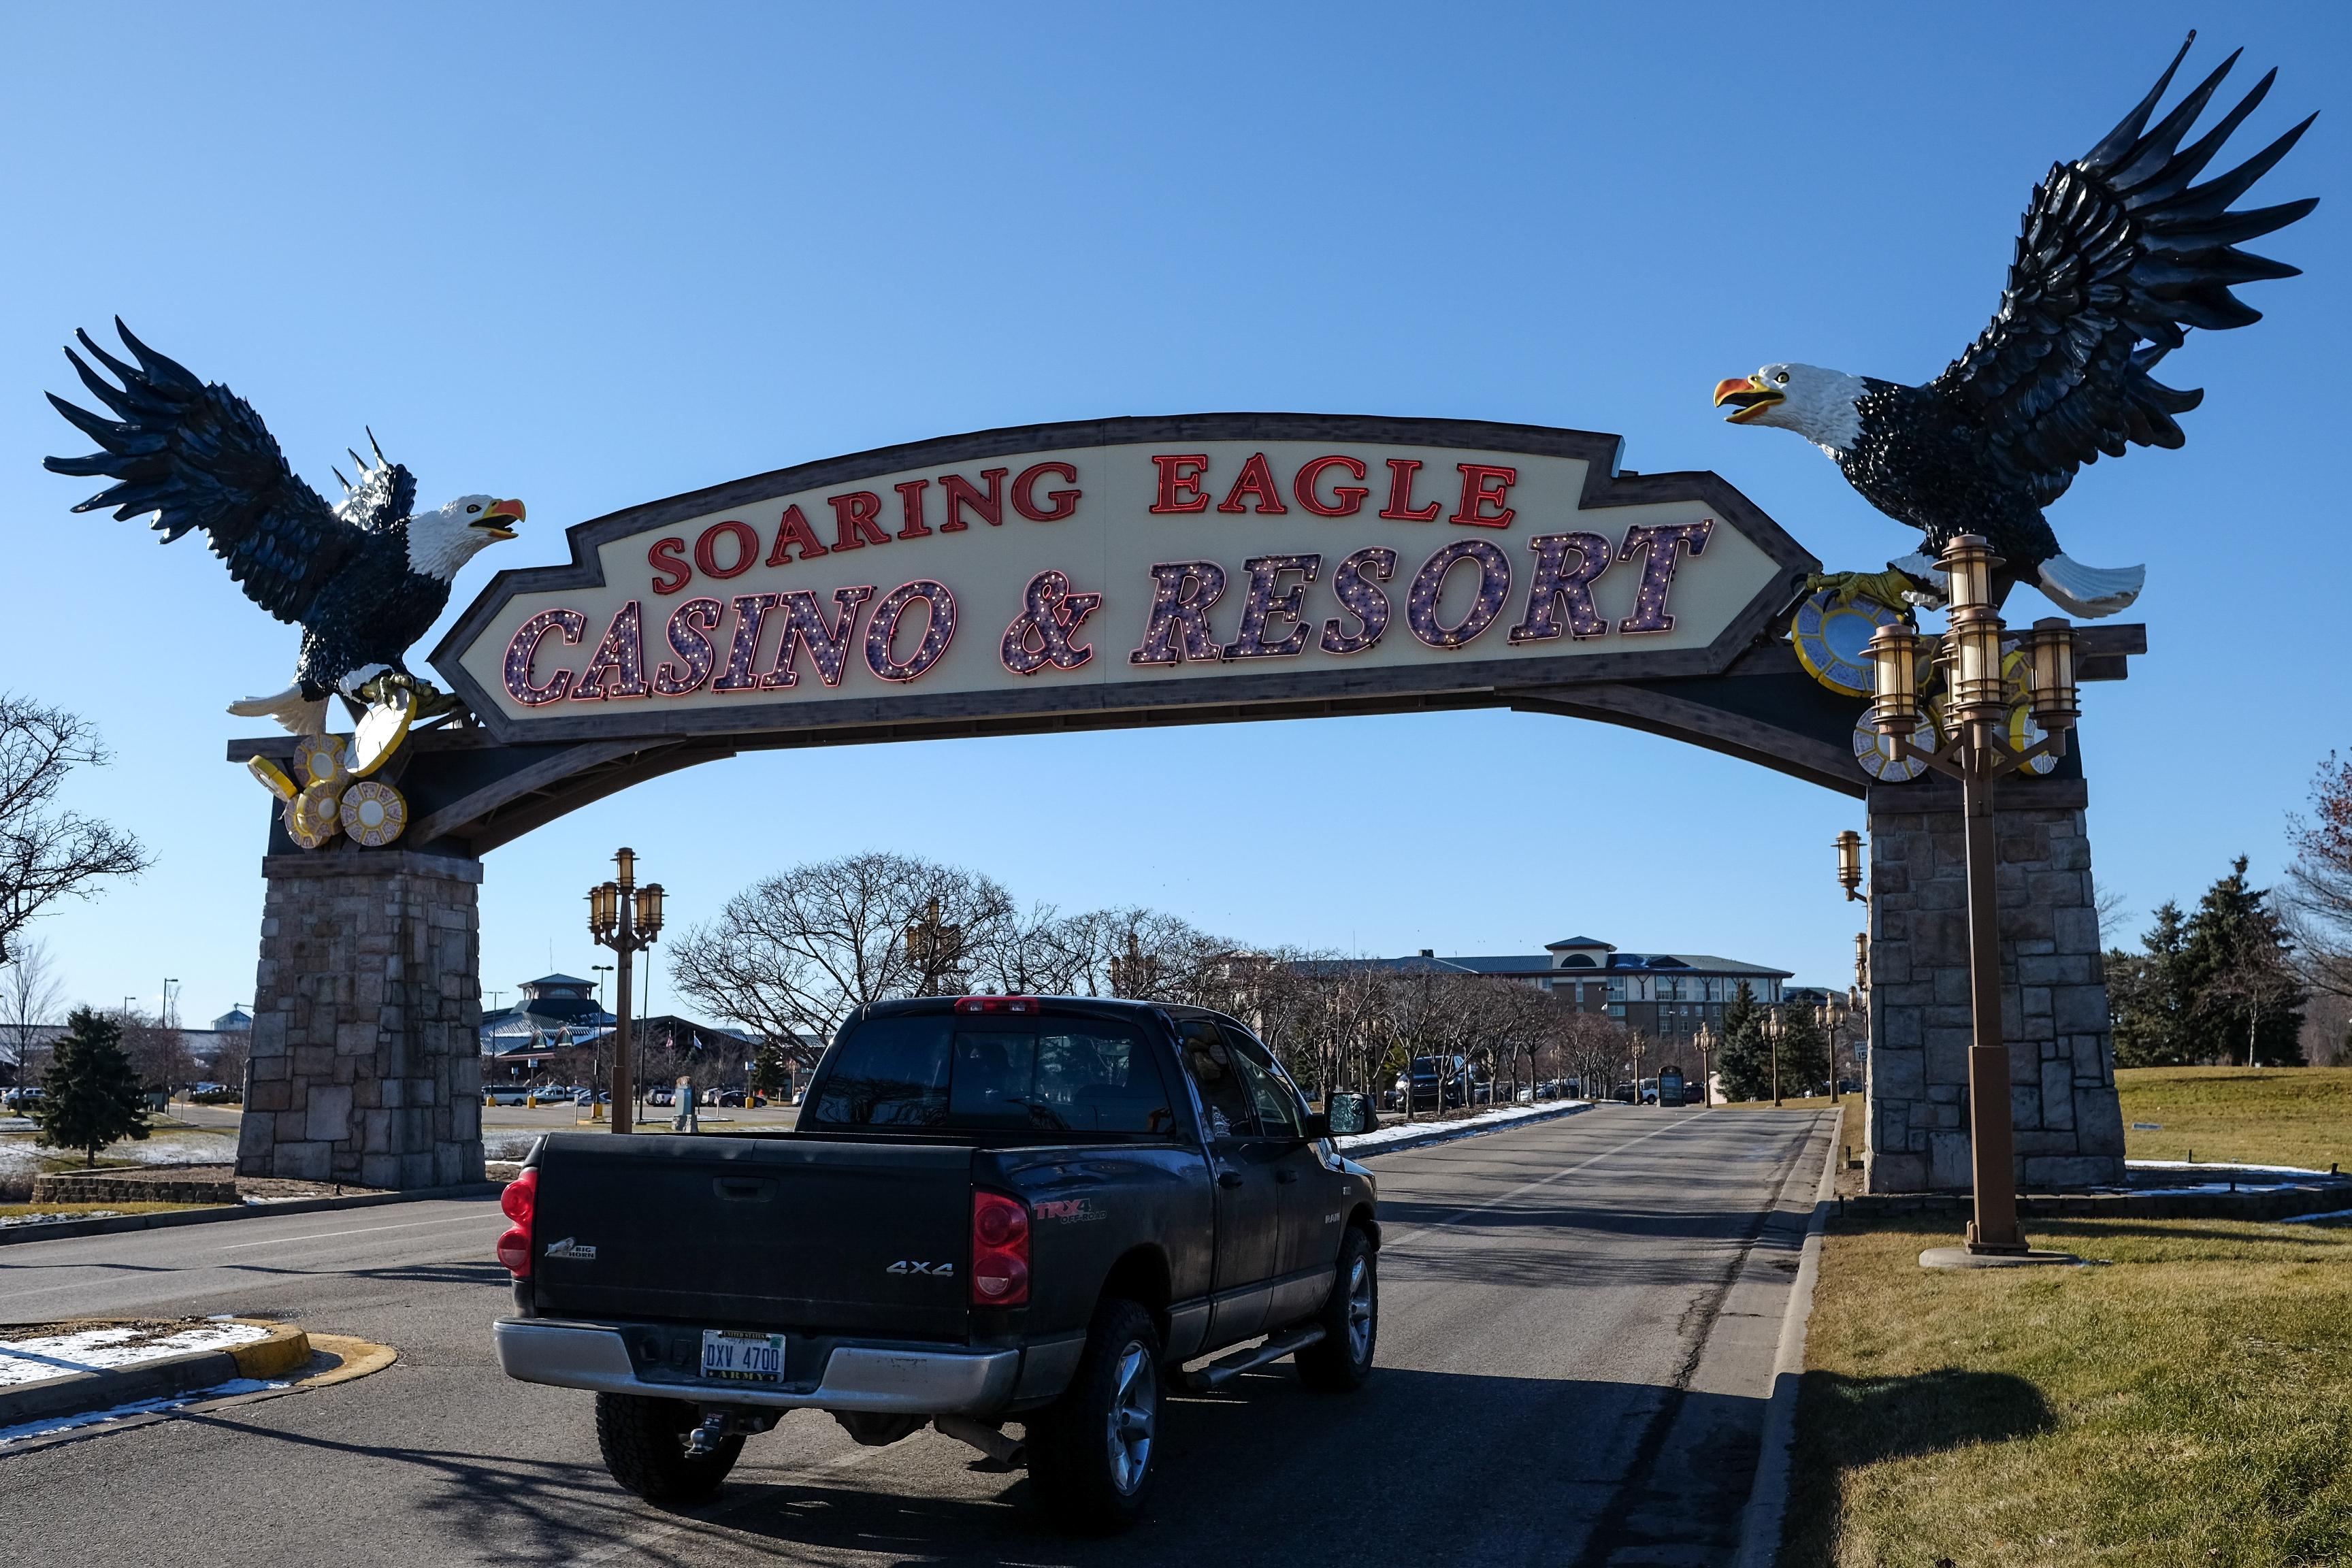 Soaring eagle casino deals casino nogales sonora